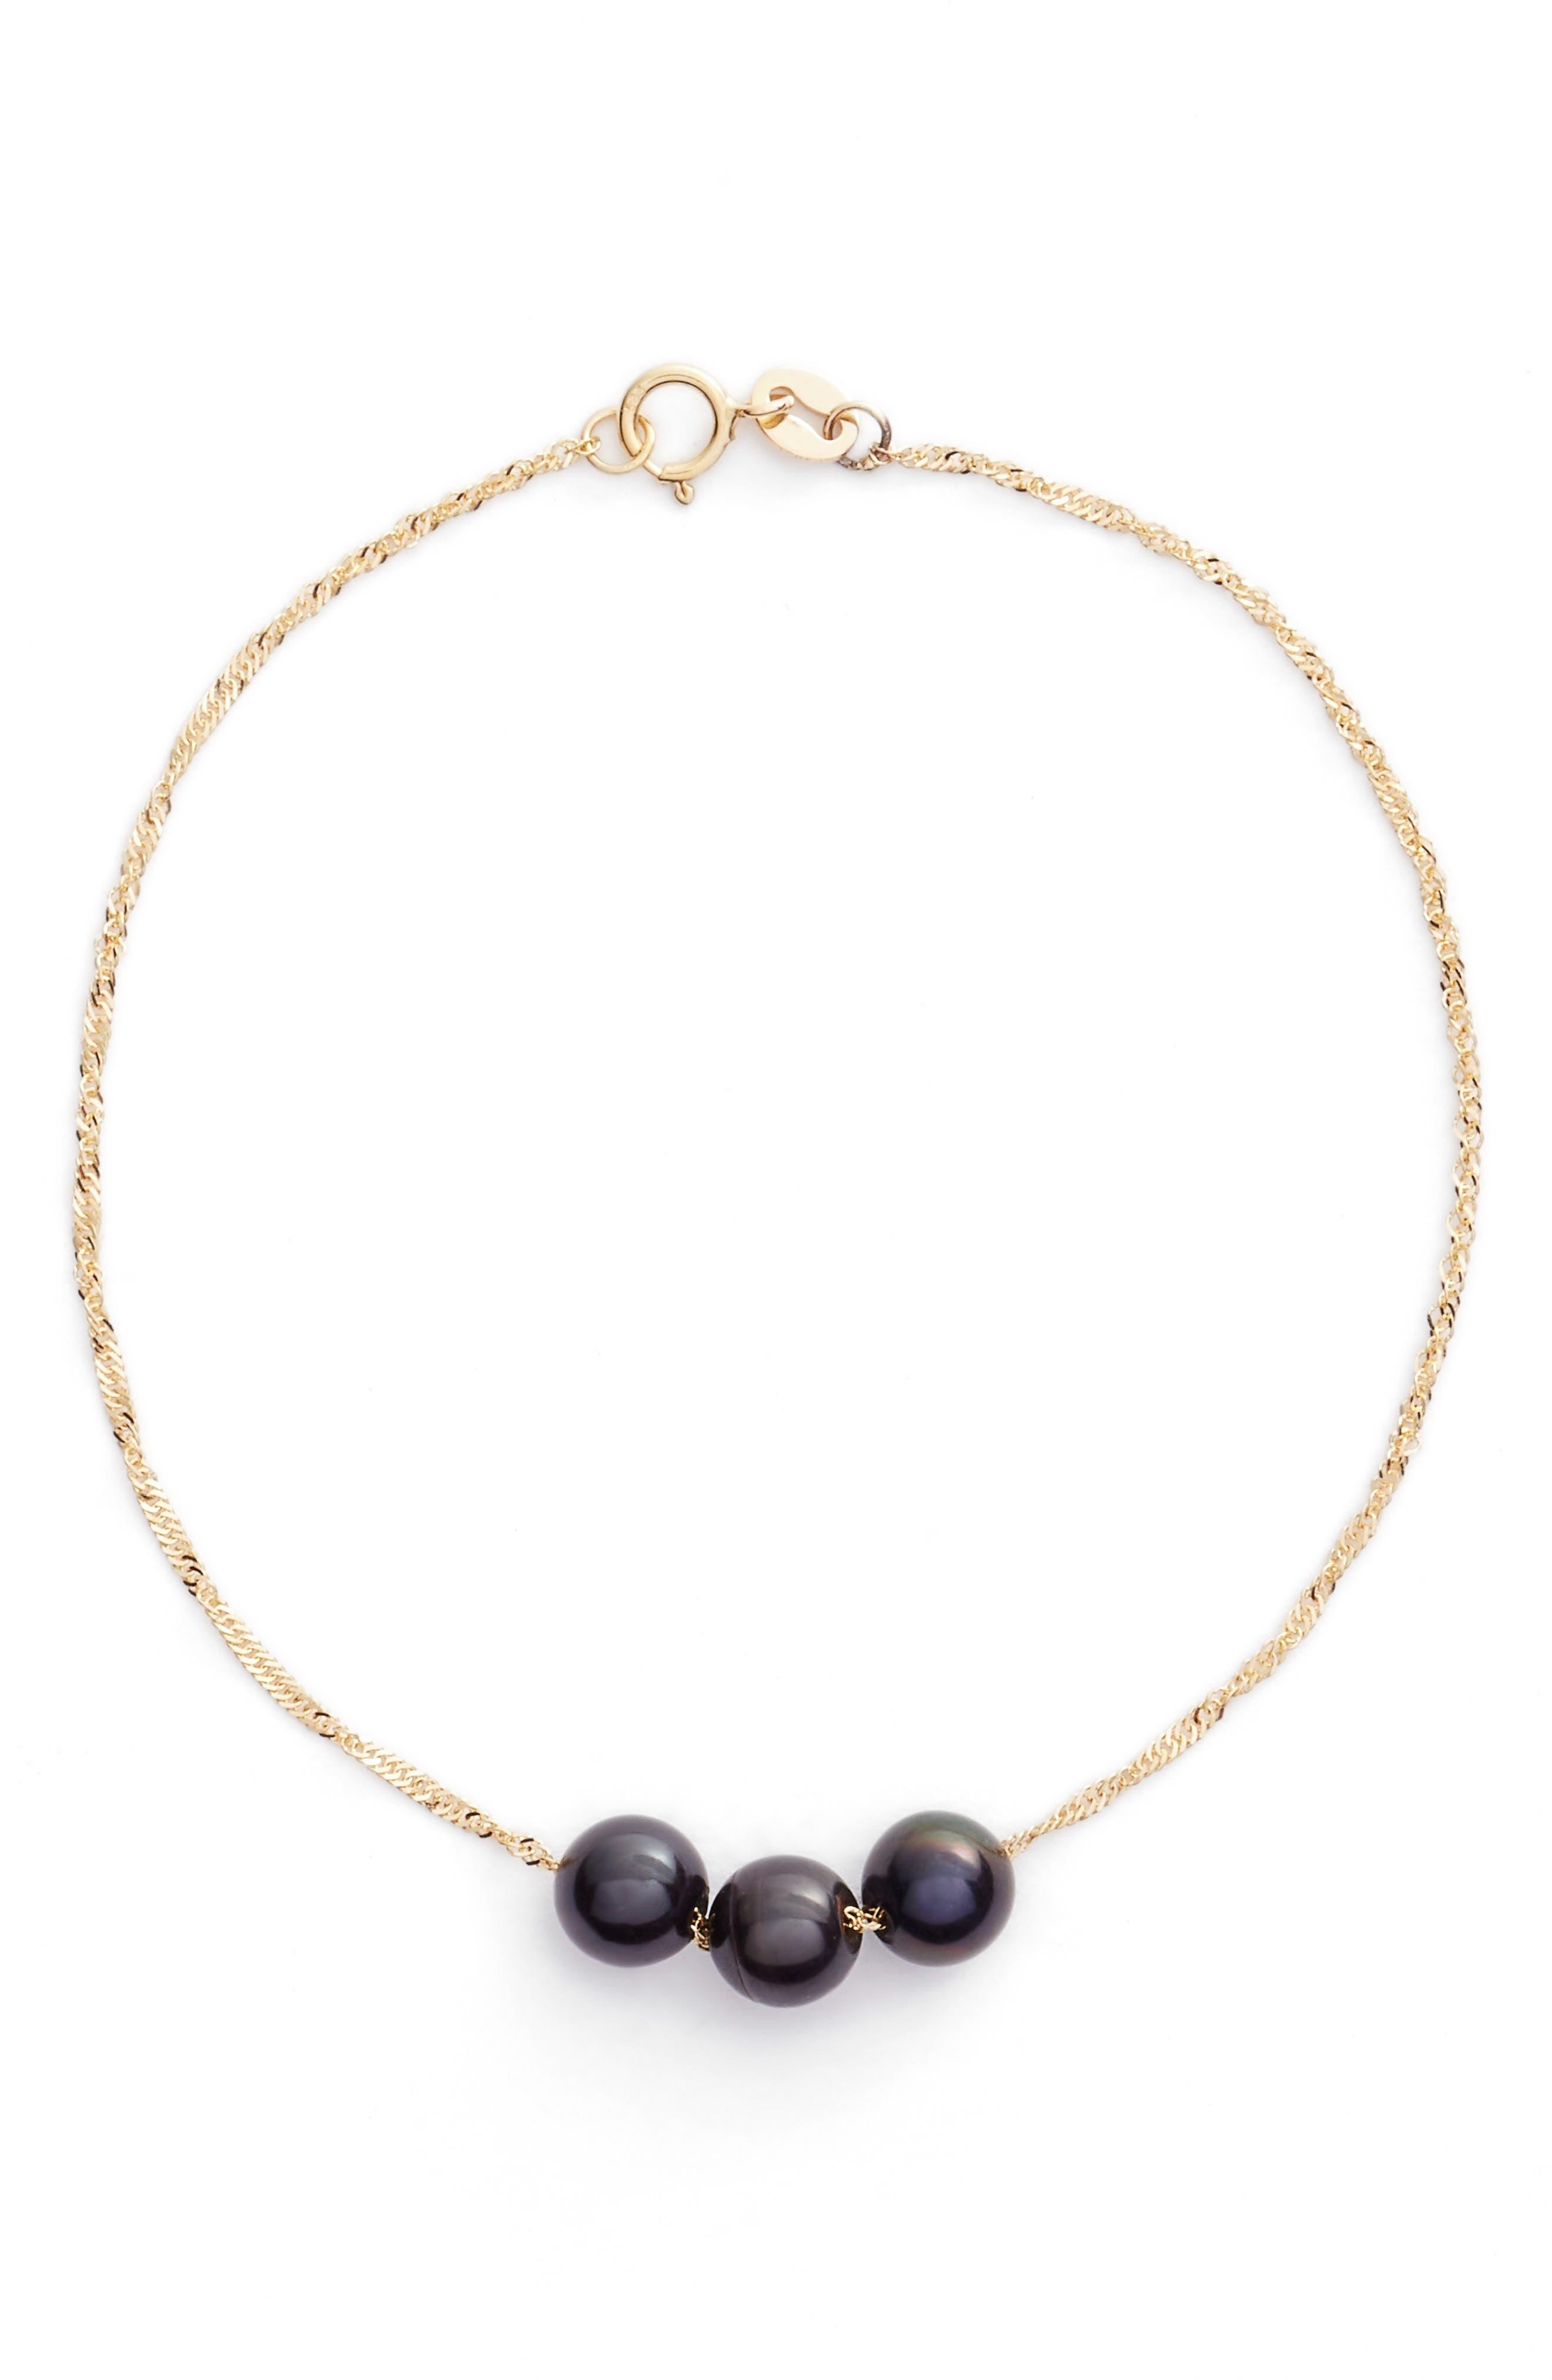 Triple Pearl Line Bracelet,                             Main thumbnail 1, color,                             YELLOW GOLD/ BLACK PEARL